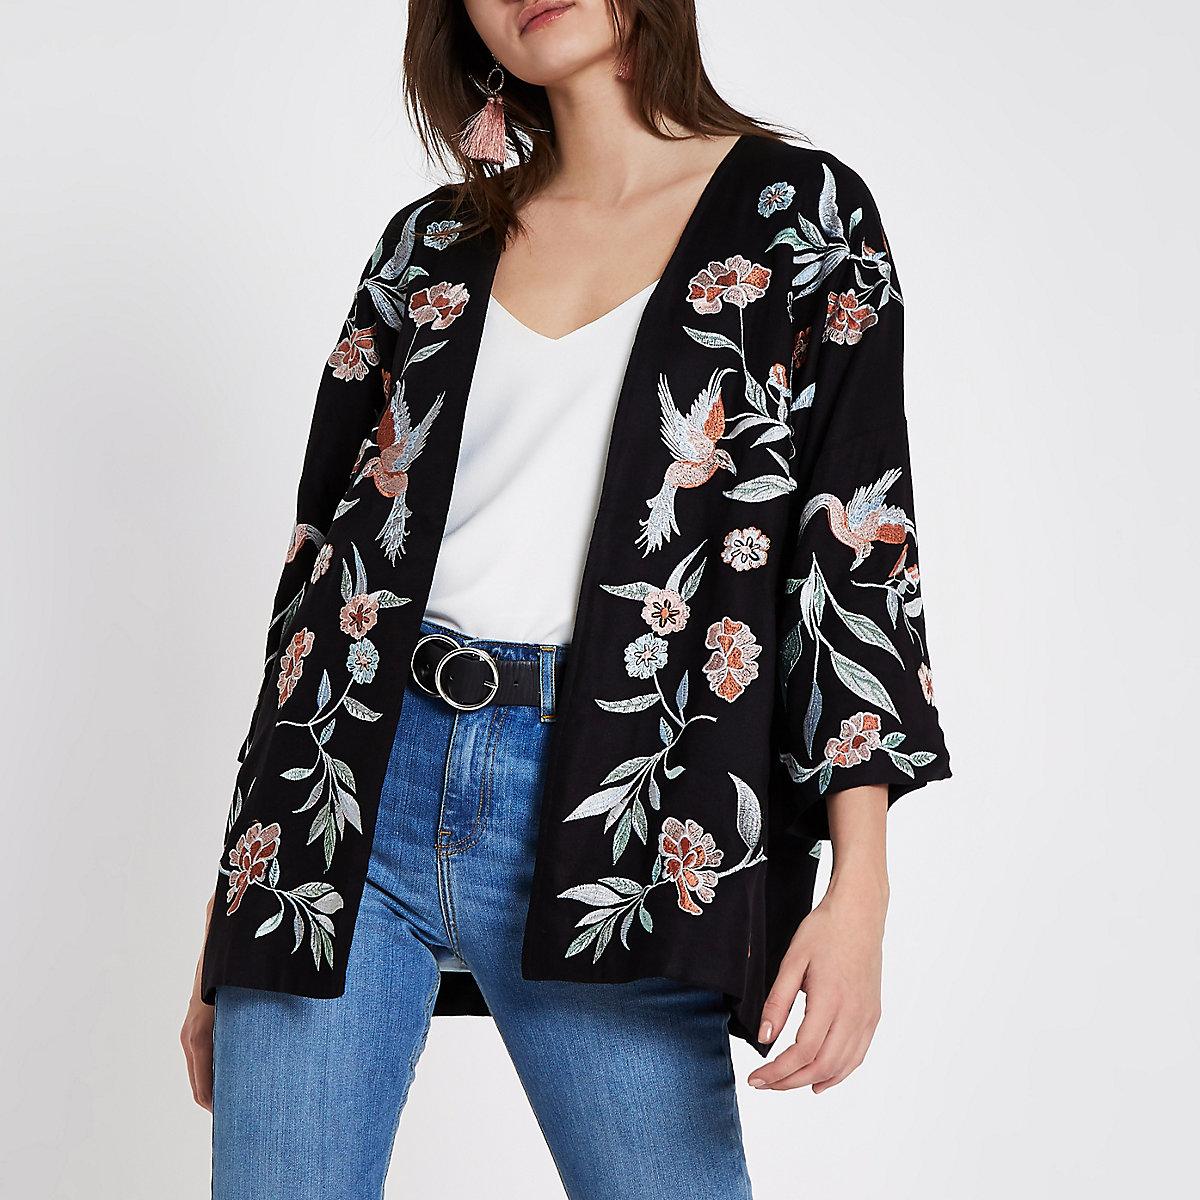 Black floral and bird embroidered kimono